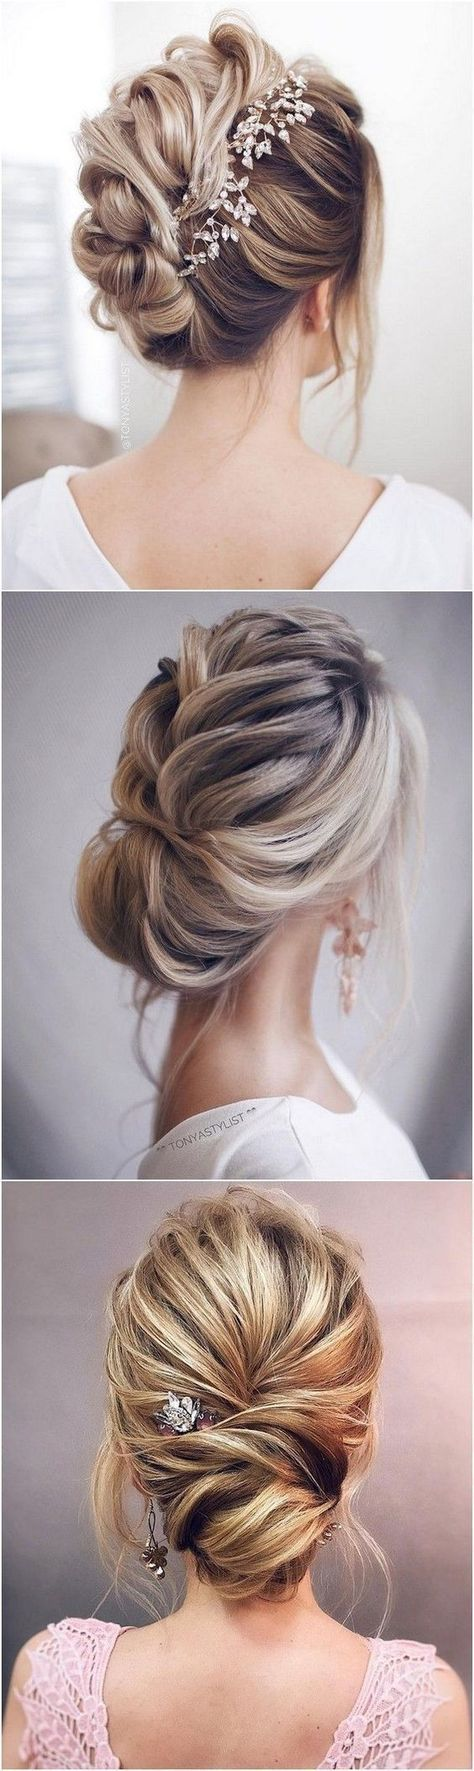 Idée Coiffure : Description elegant updo wedding hairstyles #wedding #hairstyle…